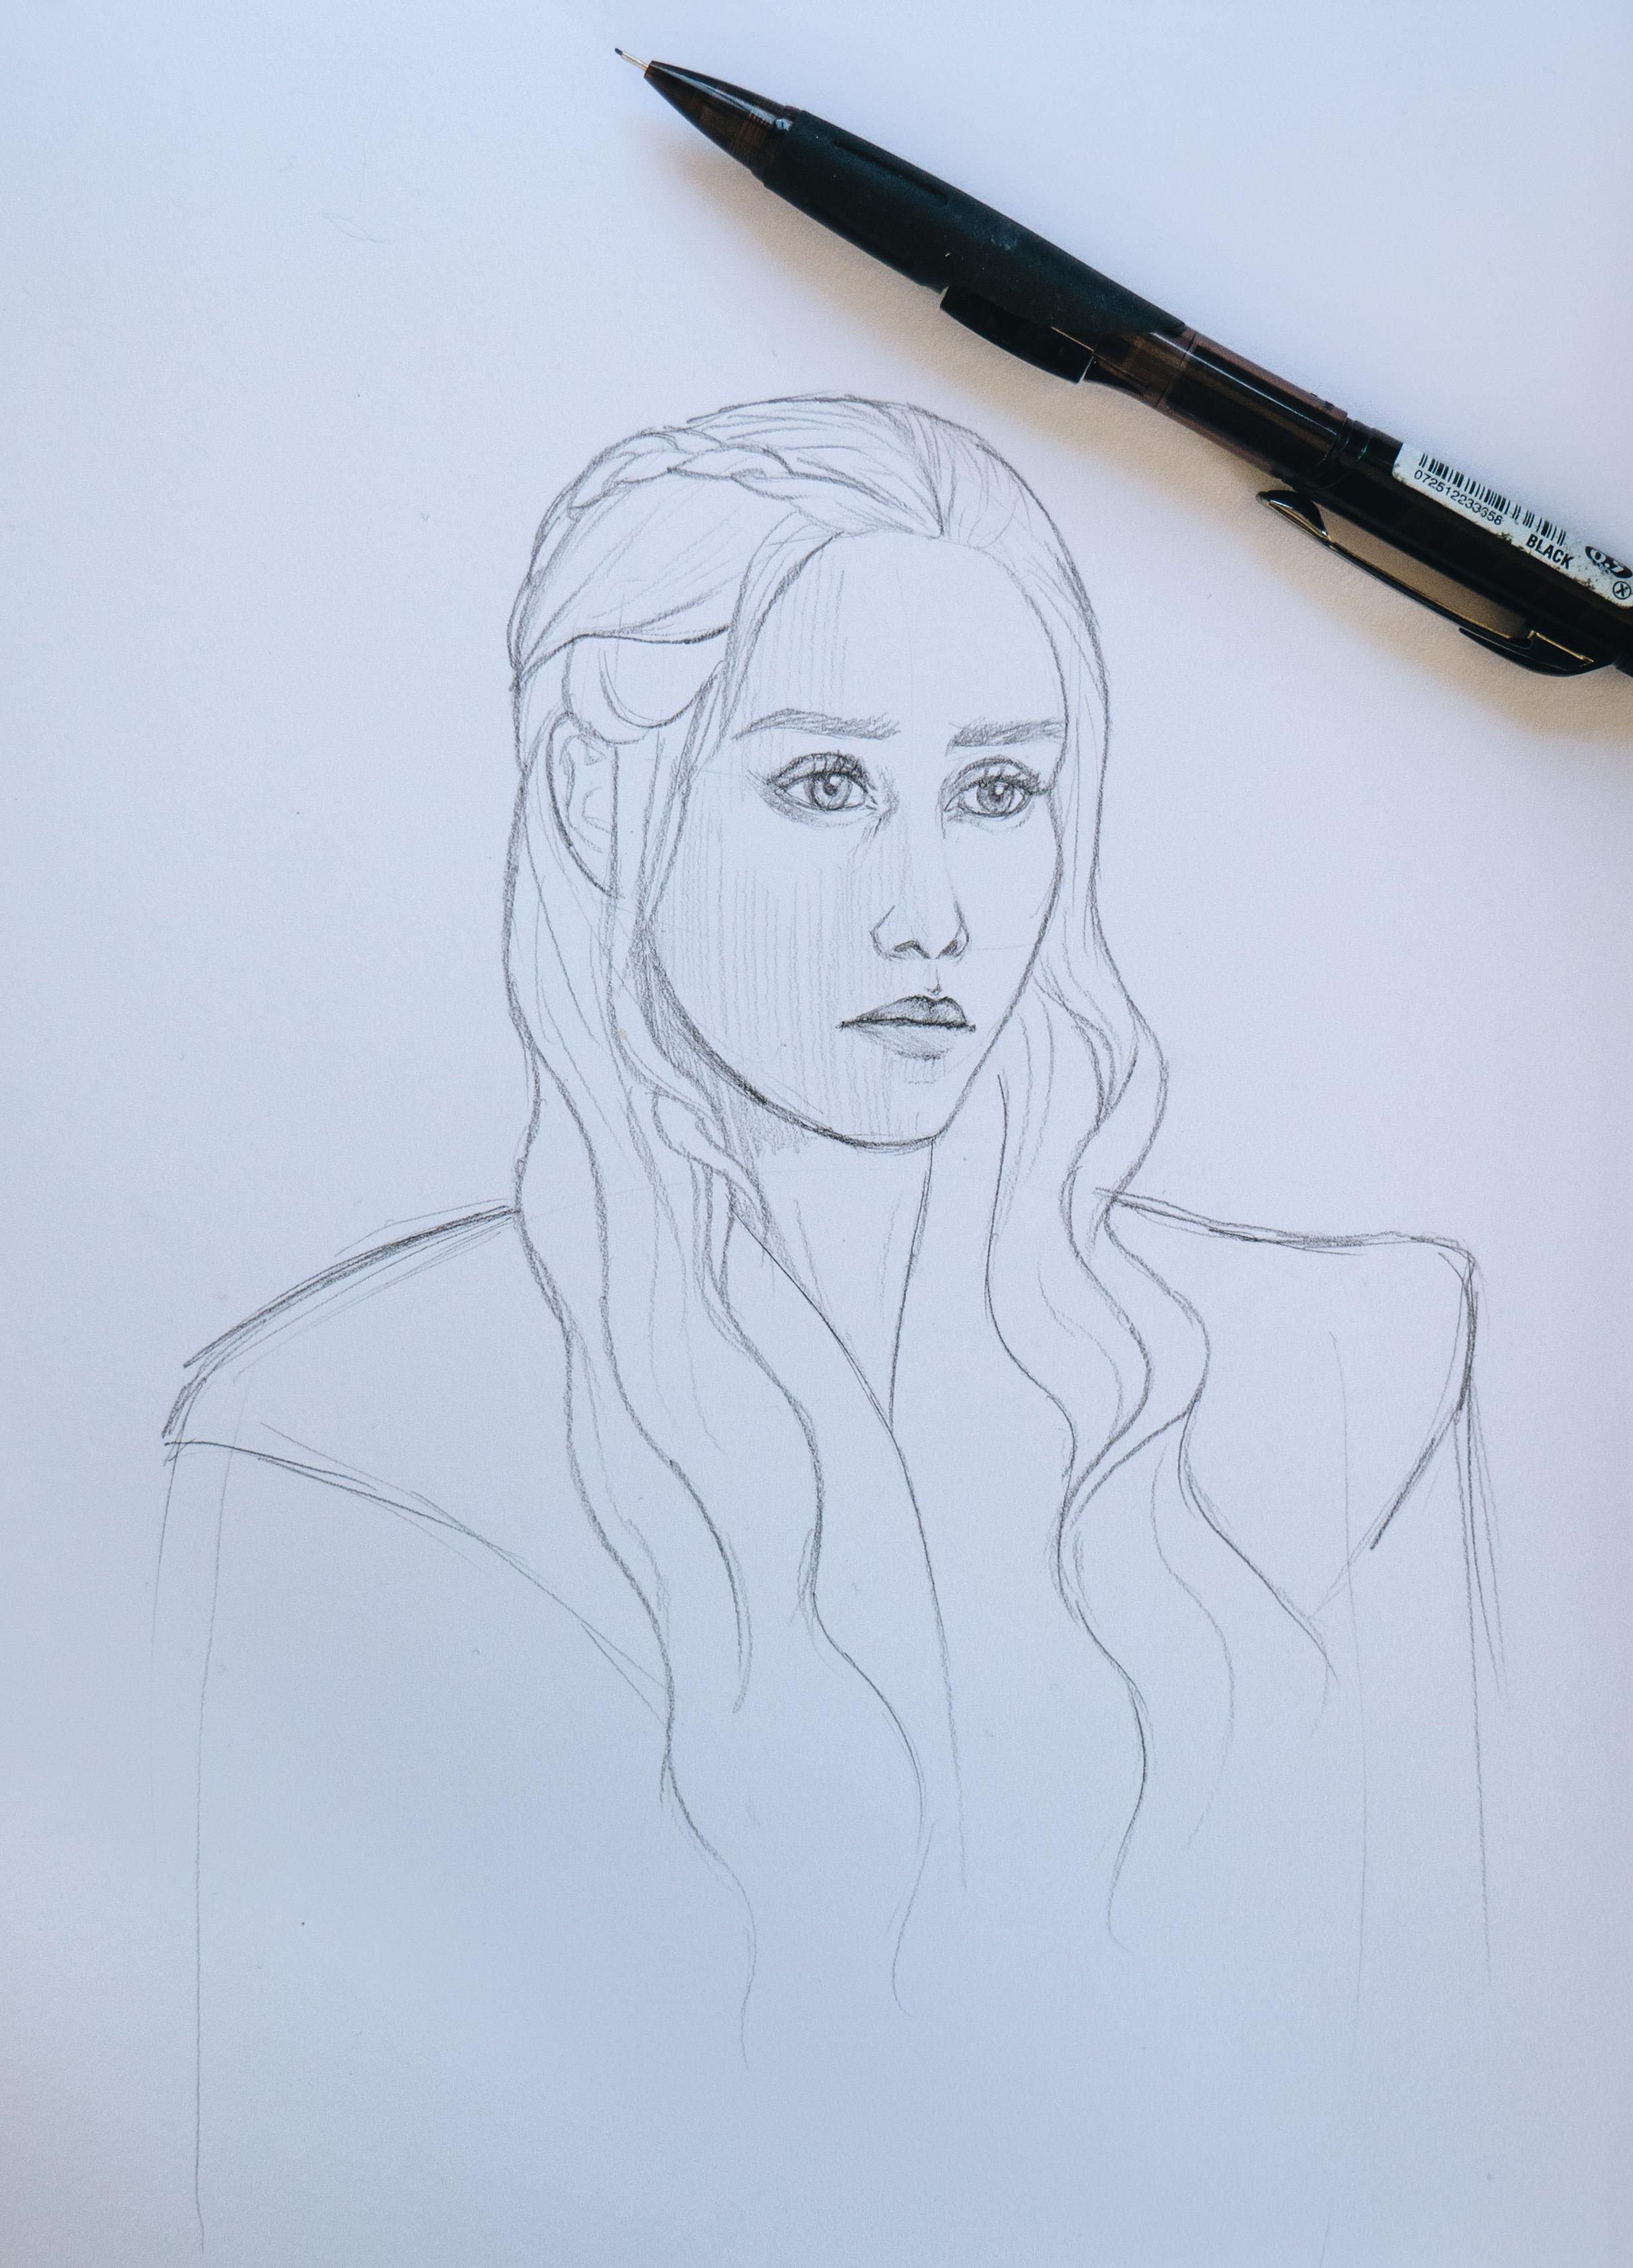 Daenerys Targeryen from Game of Thrones :)